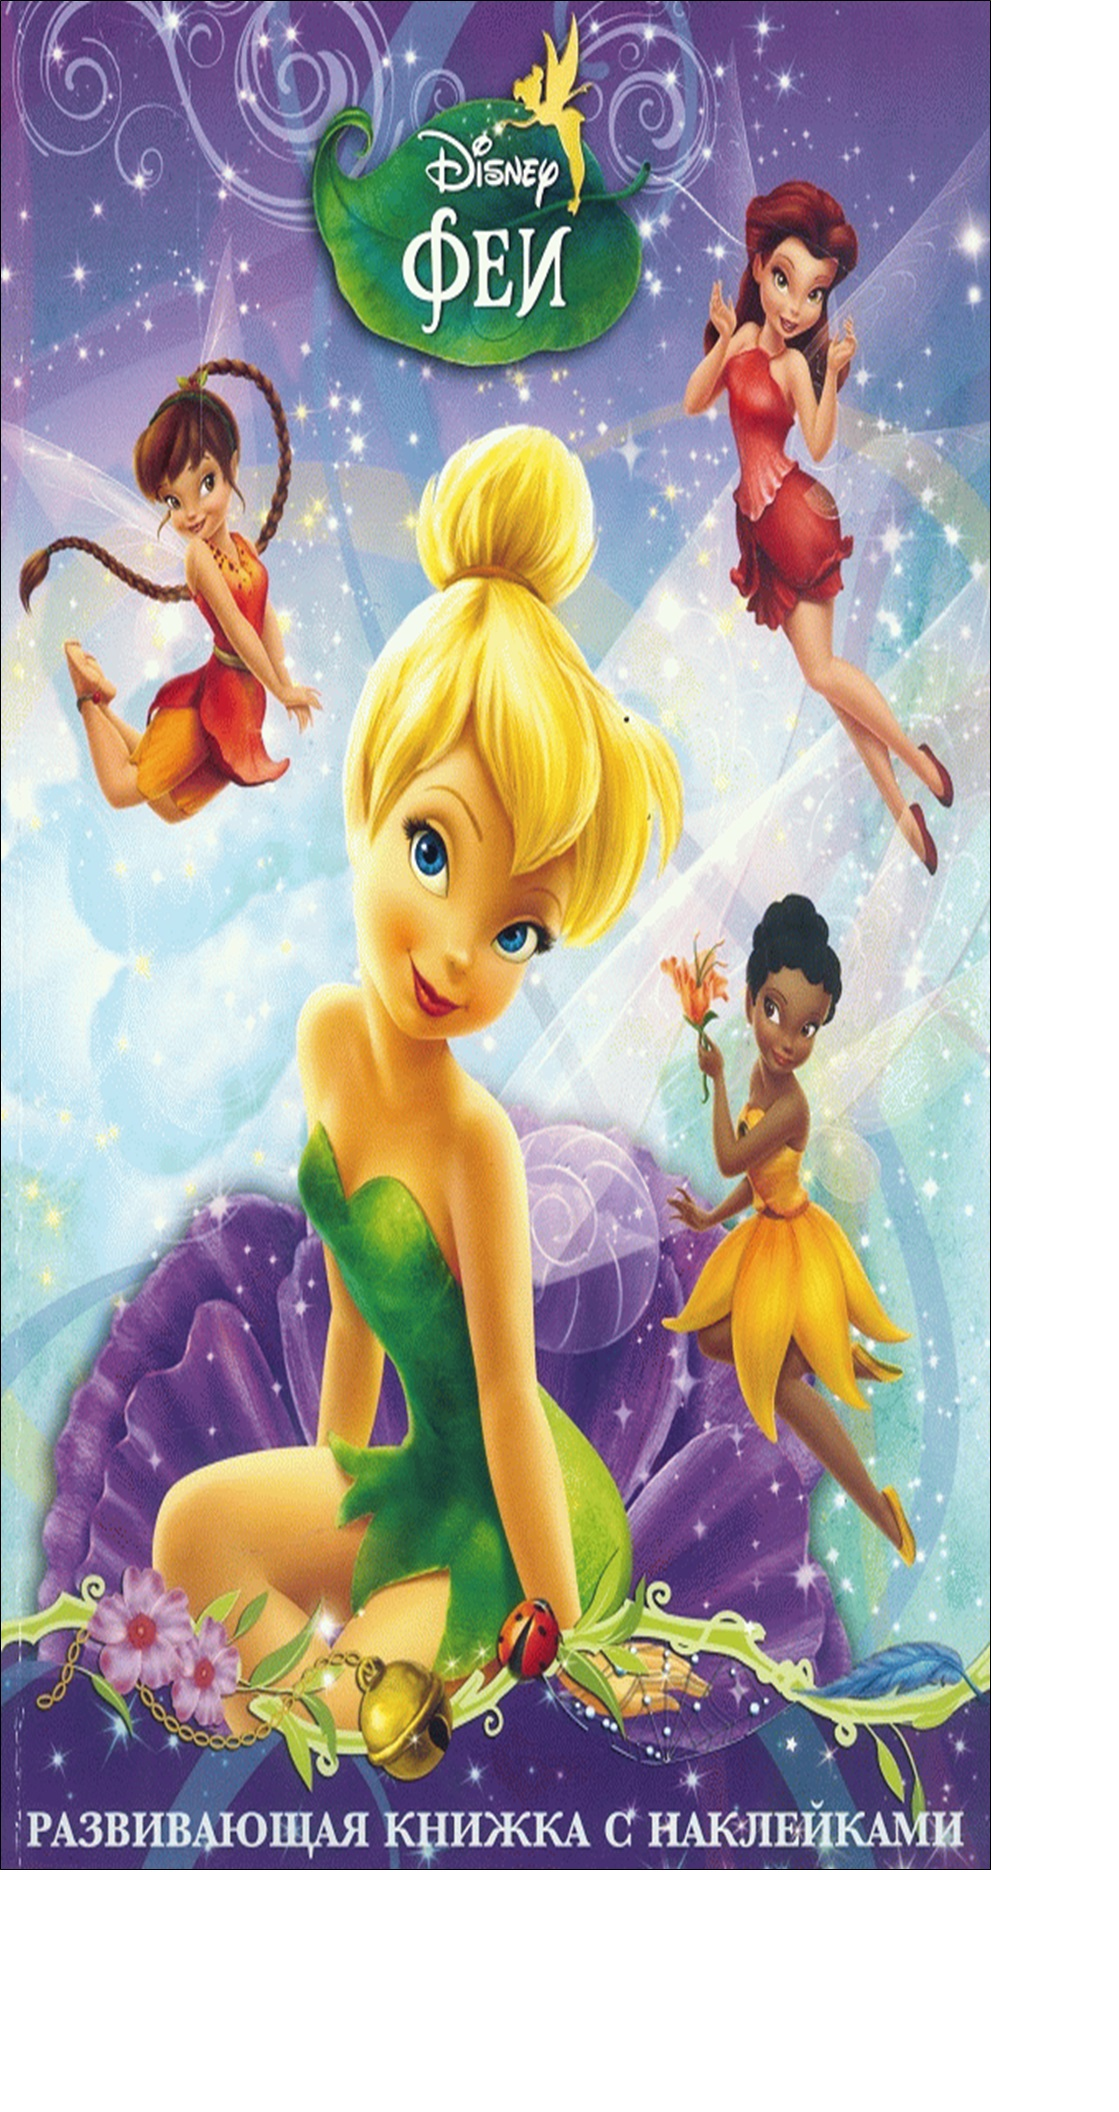 Disney, Феи Феи. Развивающая книжка с наклейками. симс лесли дэвидсон занна пони феи книга с наклейками